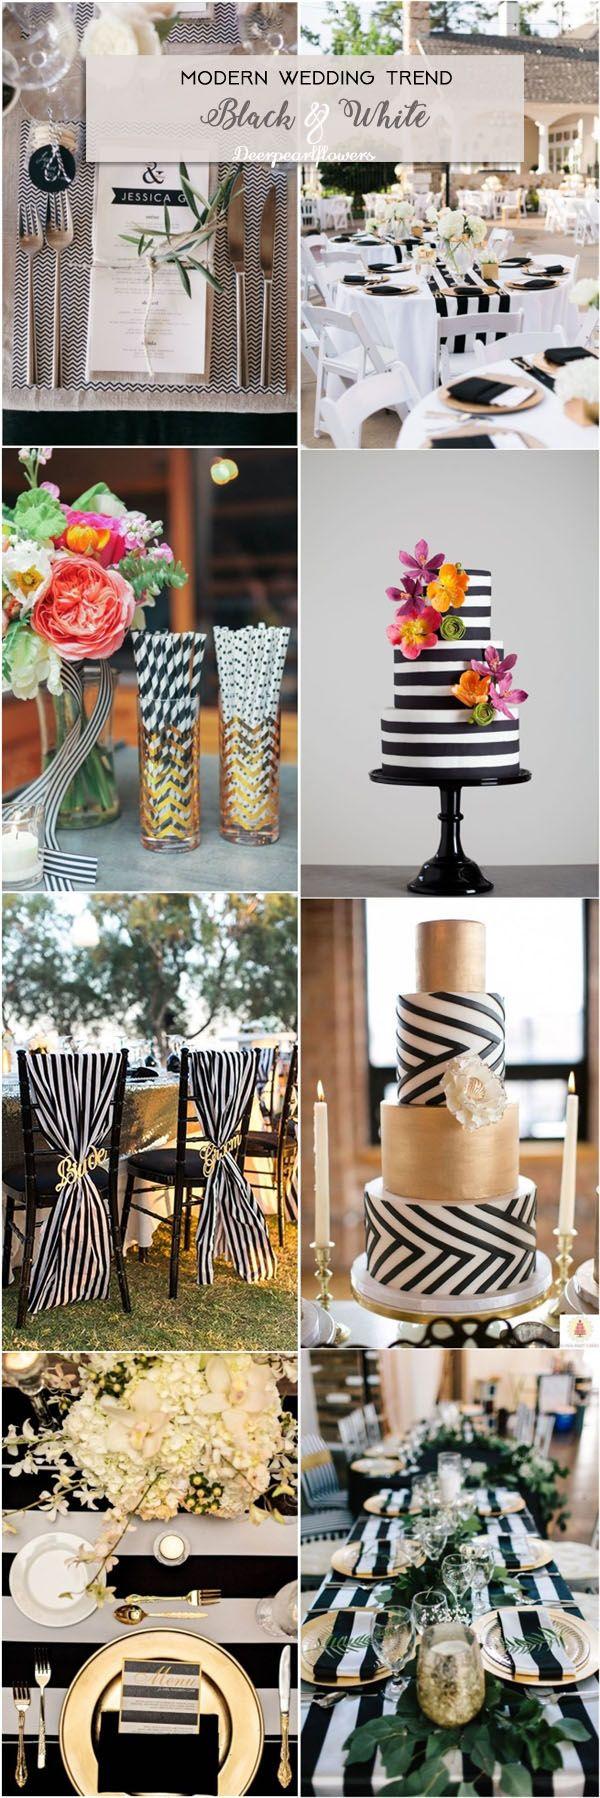 Black and White Chevron Stripes Wedding Ideas / http://www.deerpearlflowers.com/modern-wedding-theme-ideas/